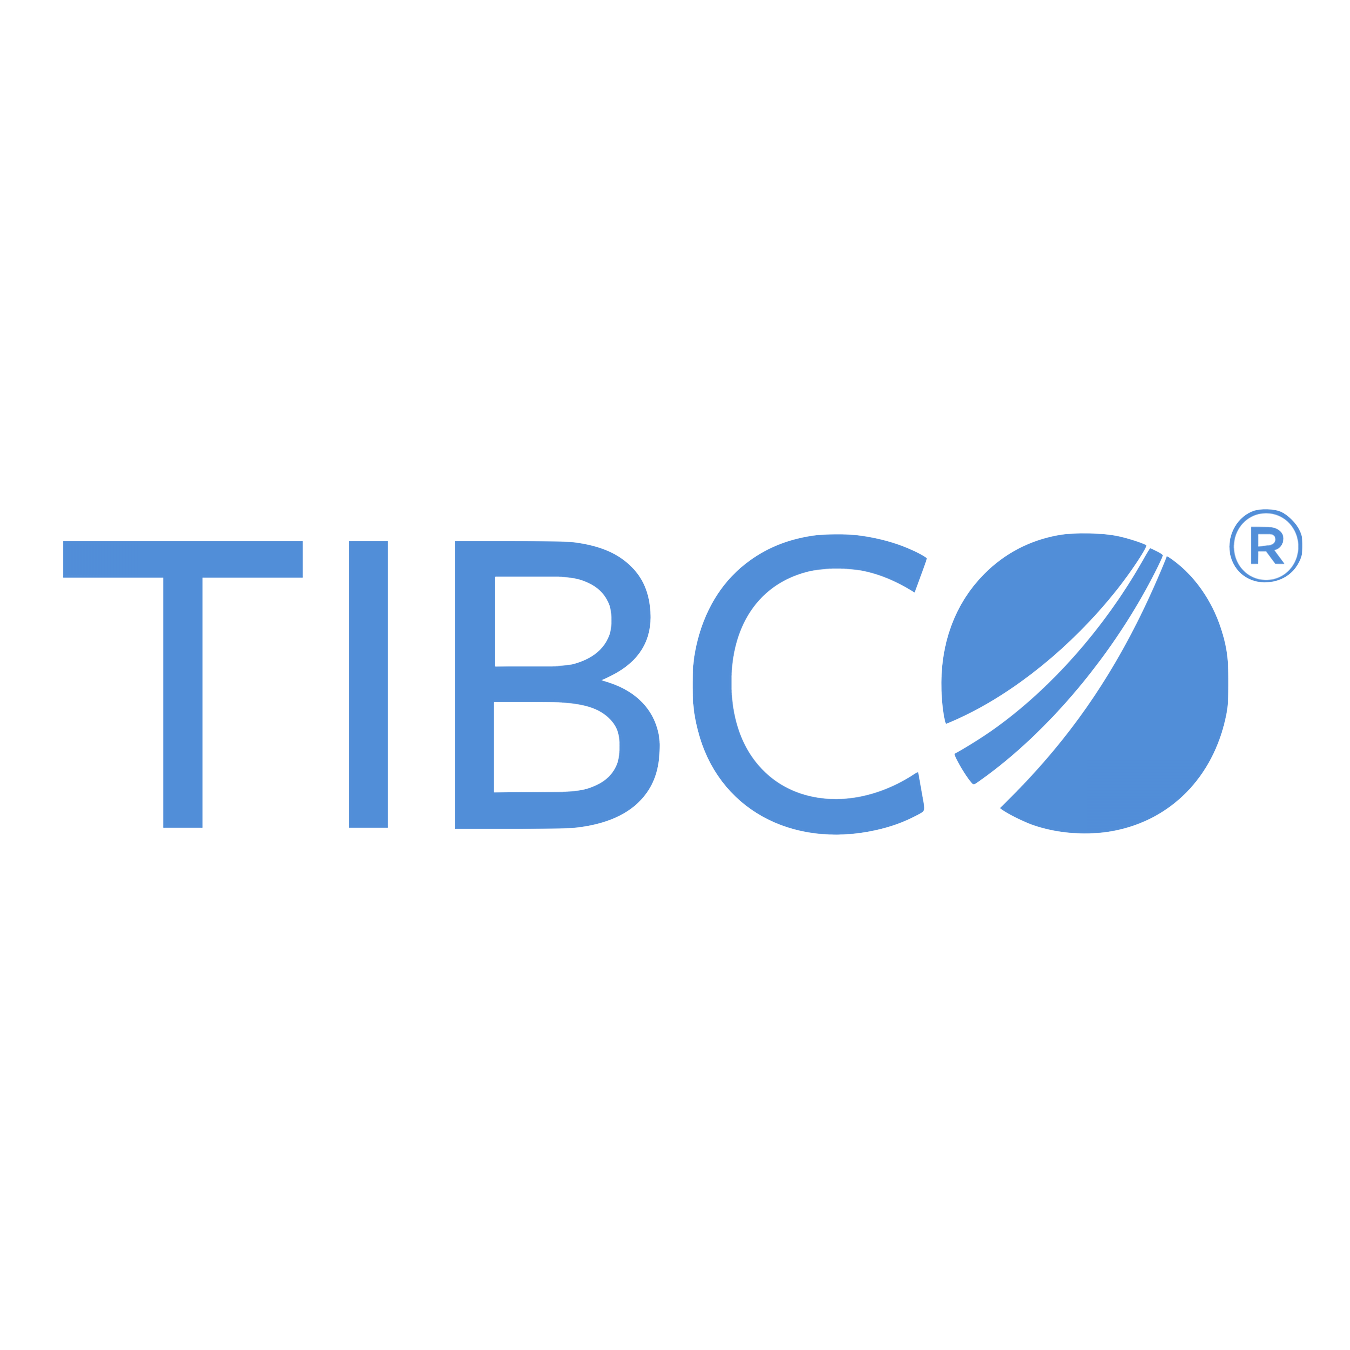 4_TIBCO.png